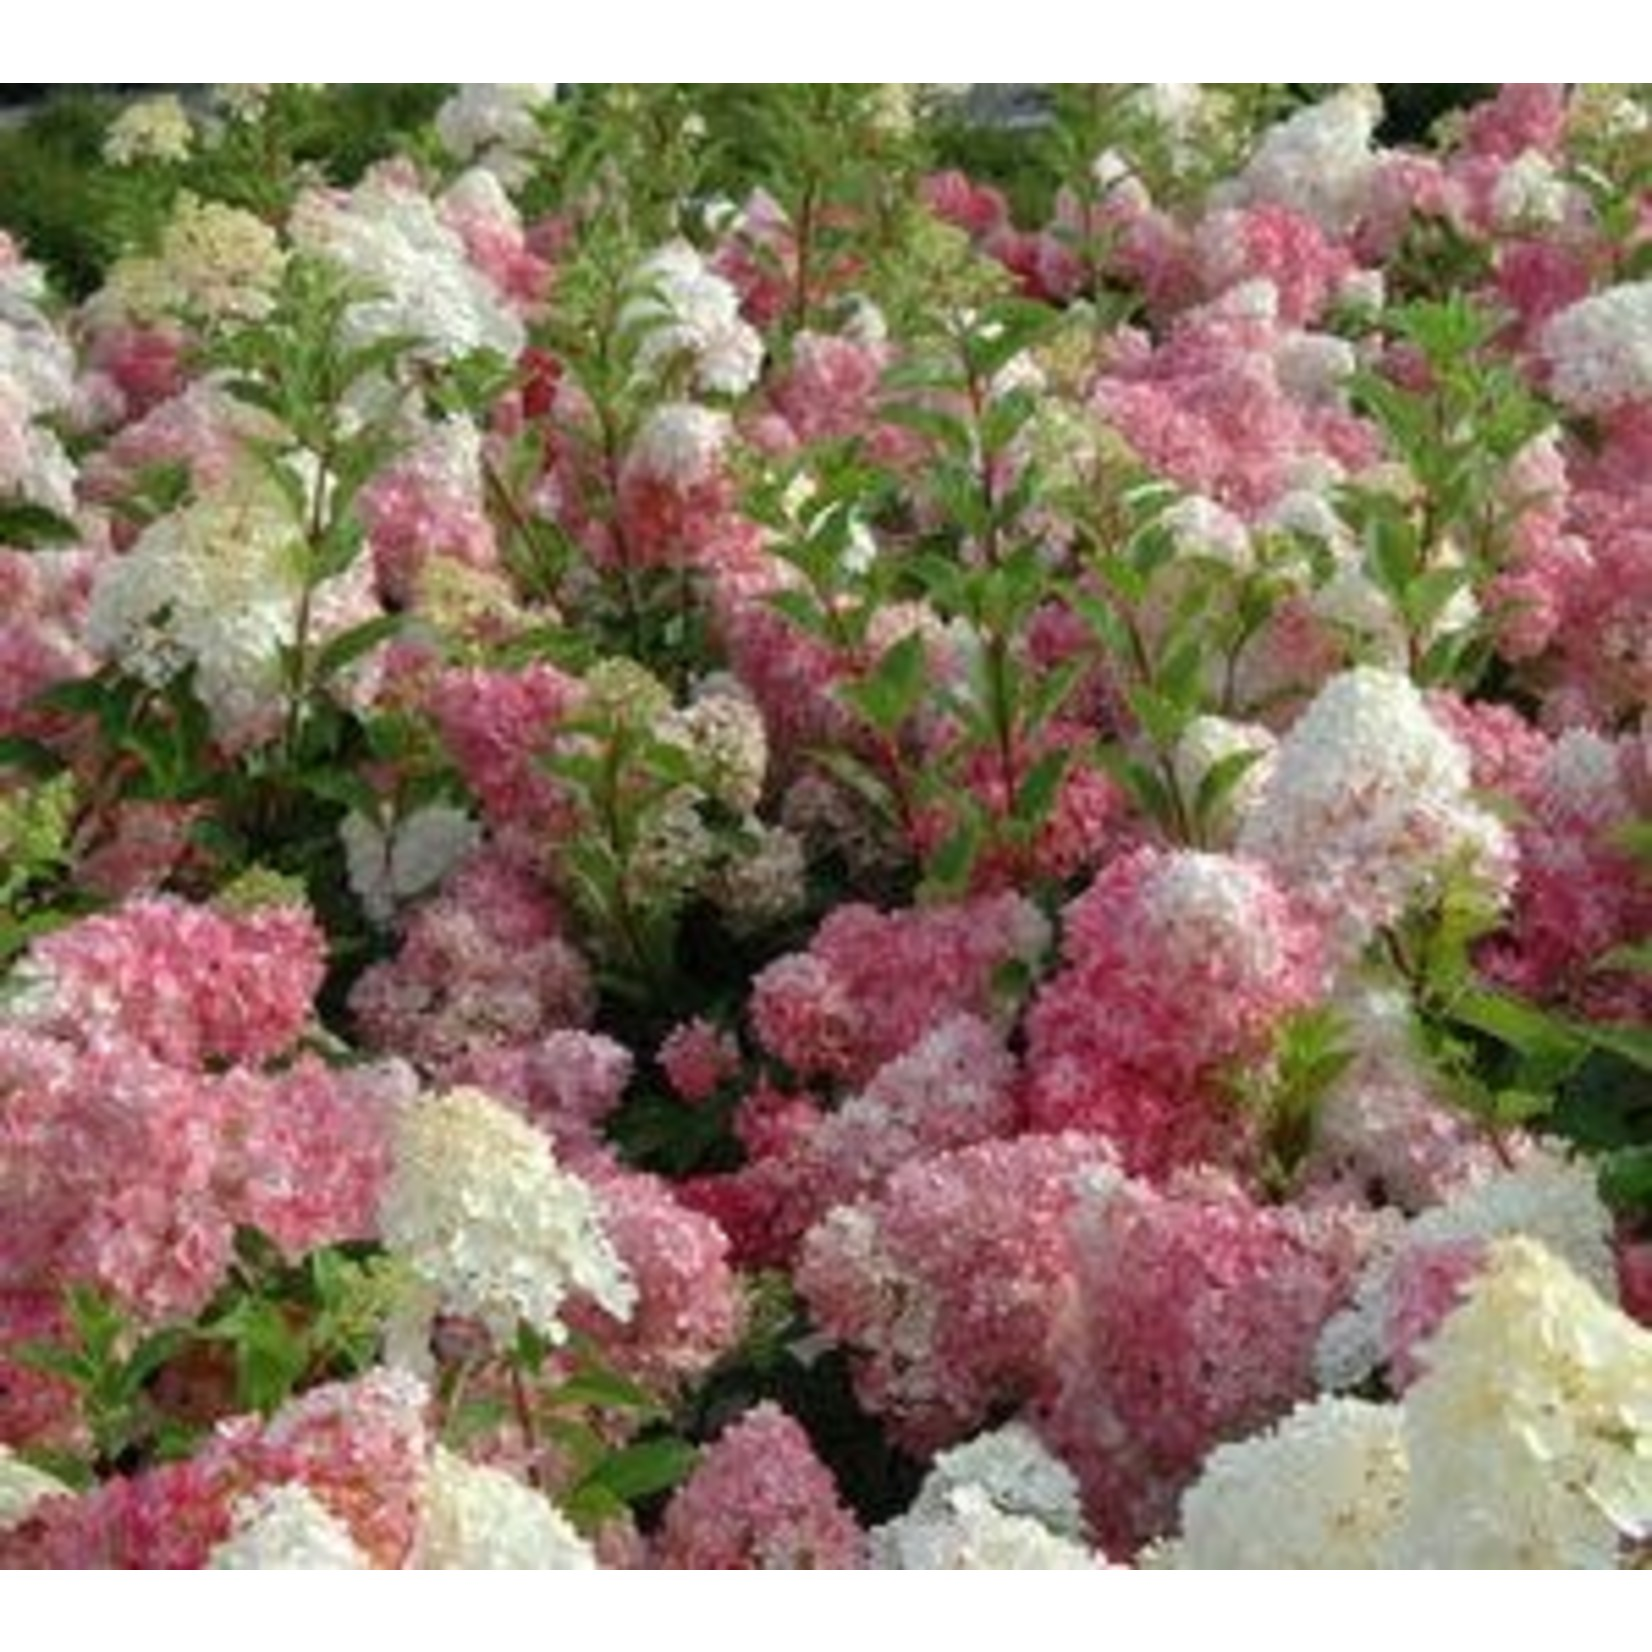 Hydrangea 'vanilla strawberry' - 3 gal